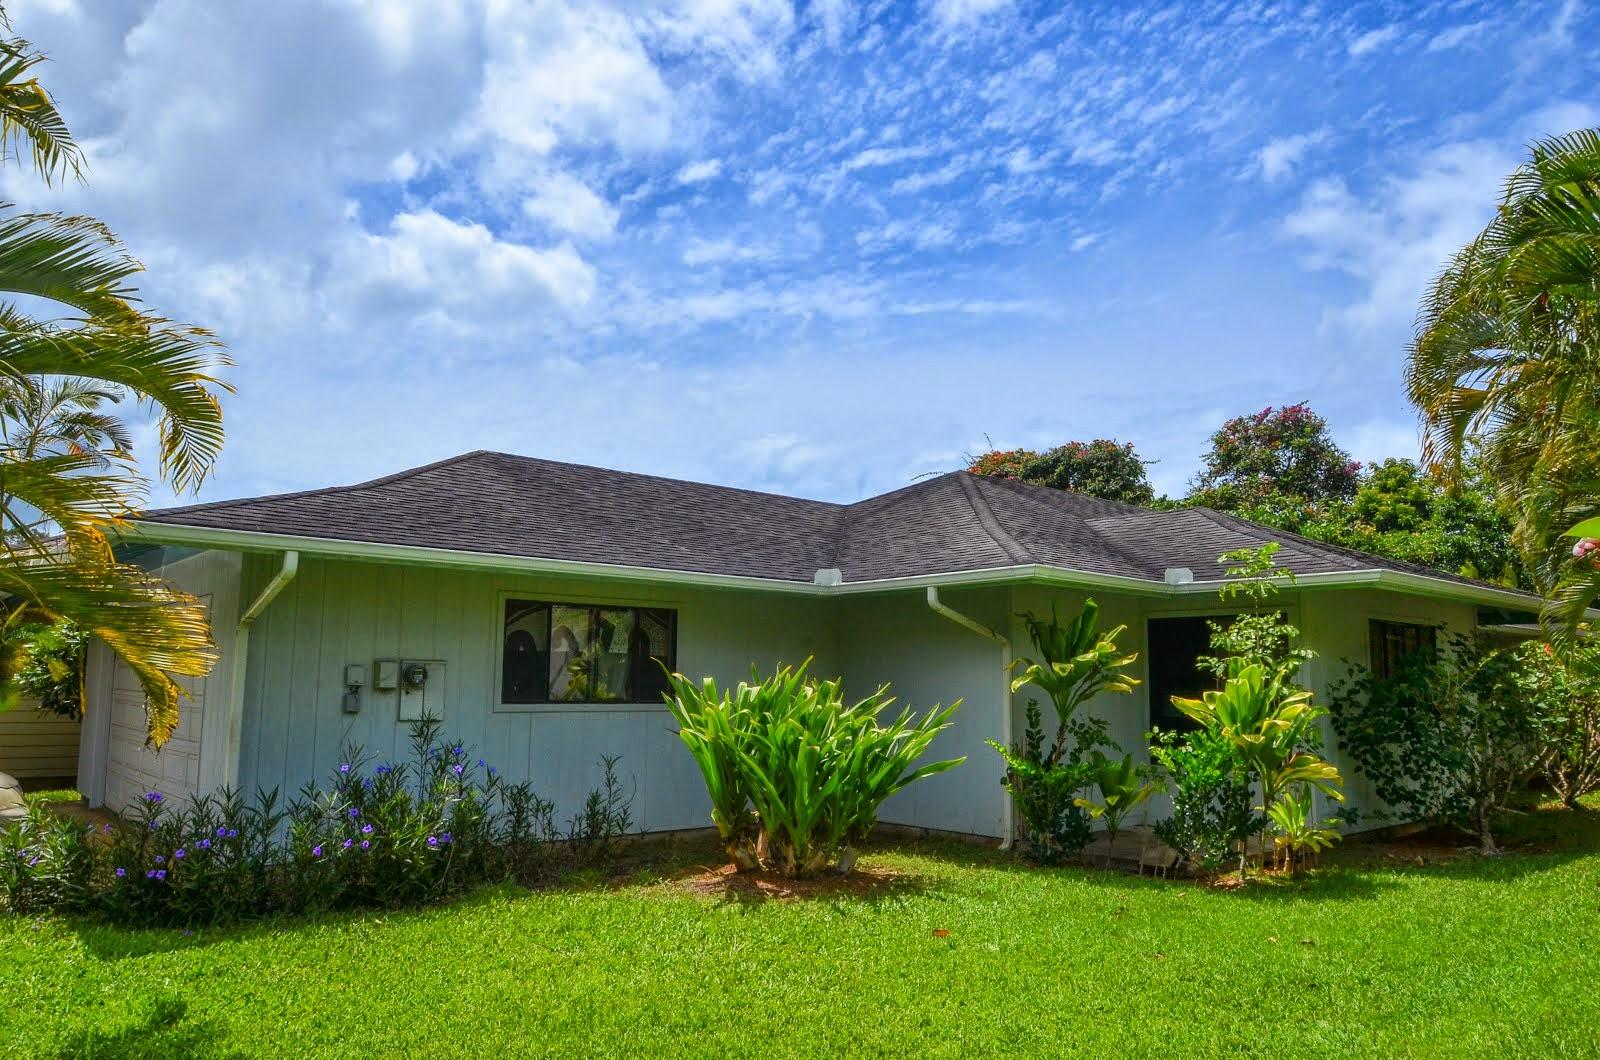 kauai real estate for sale new price princeville home